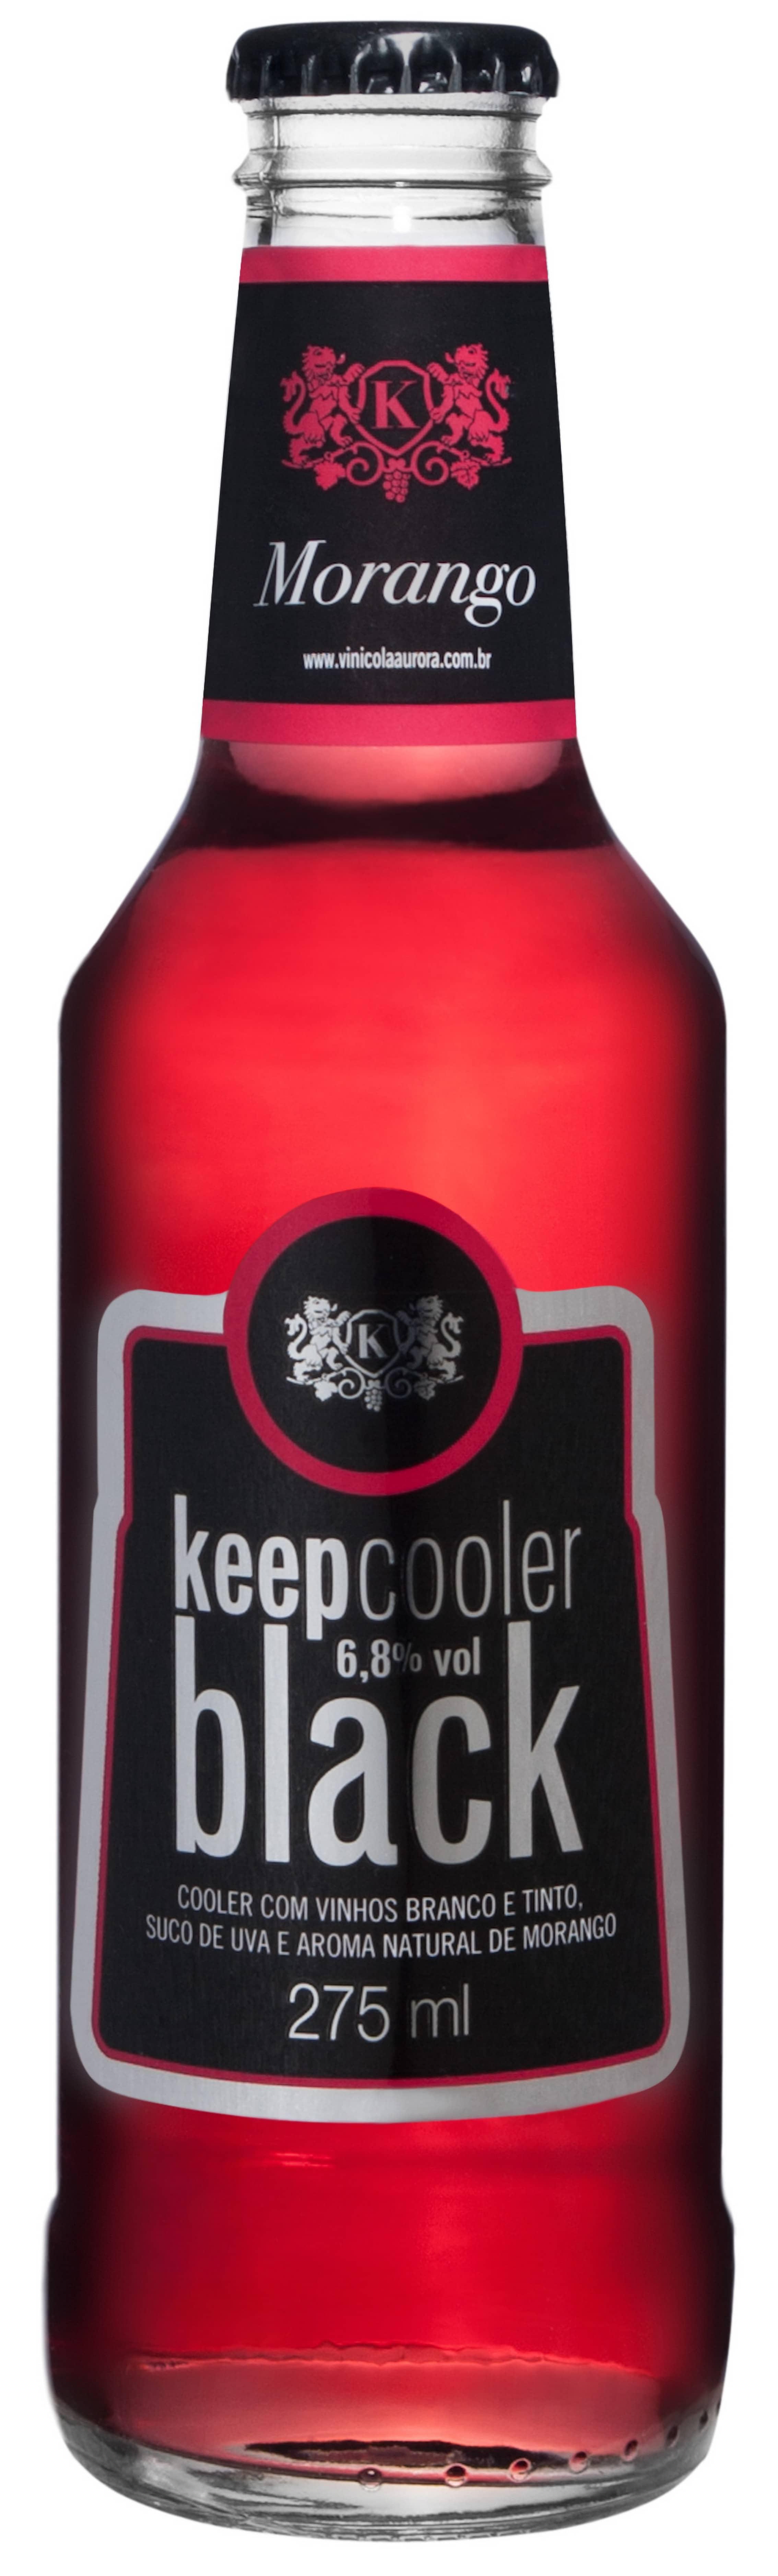 KeepCollerBlack_Morango